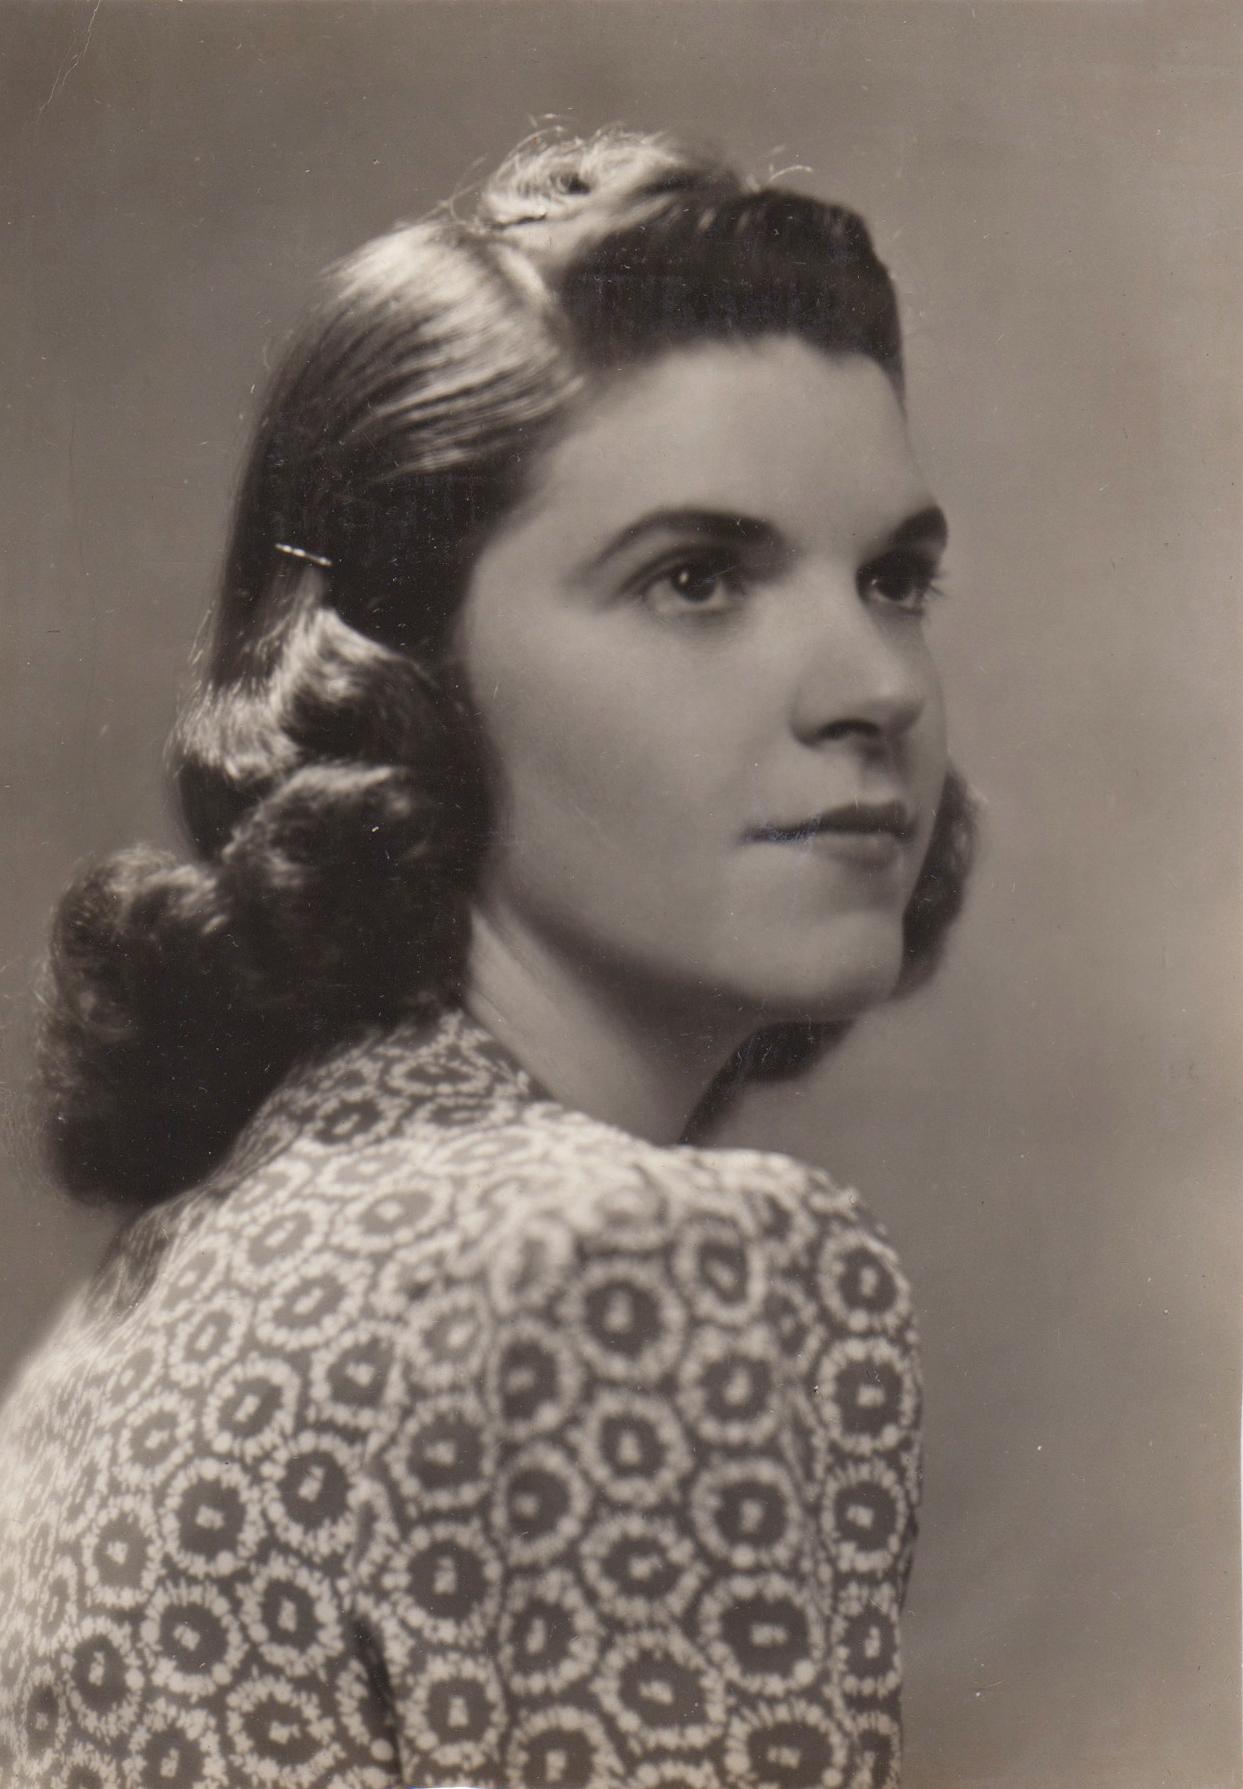 Jesse's paternal grandmother Audrey Bernice Graydon Waugh